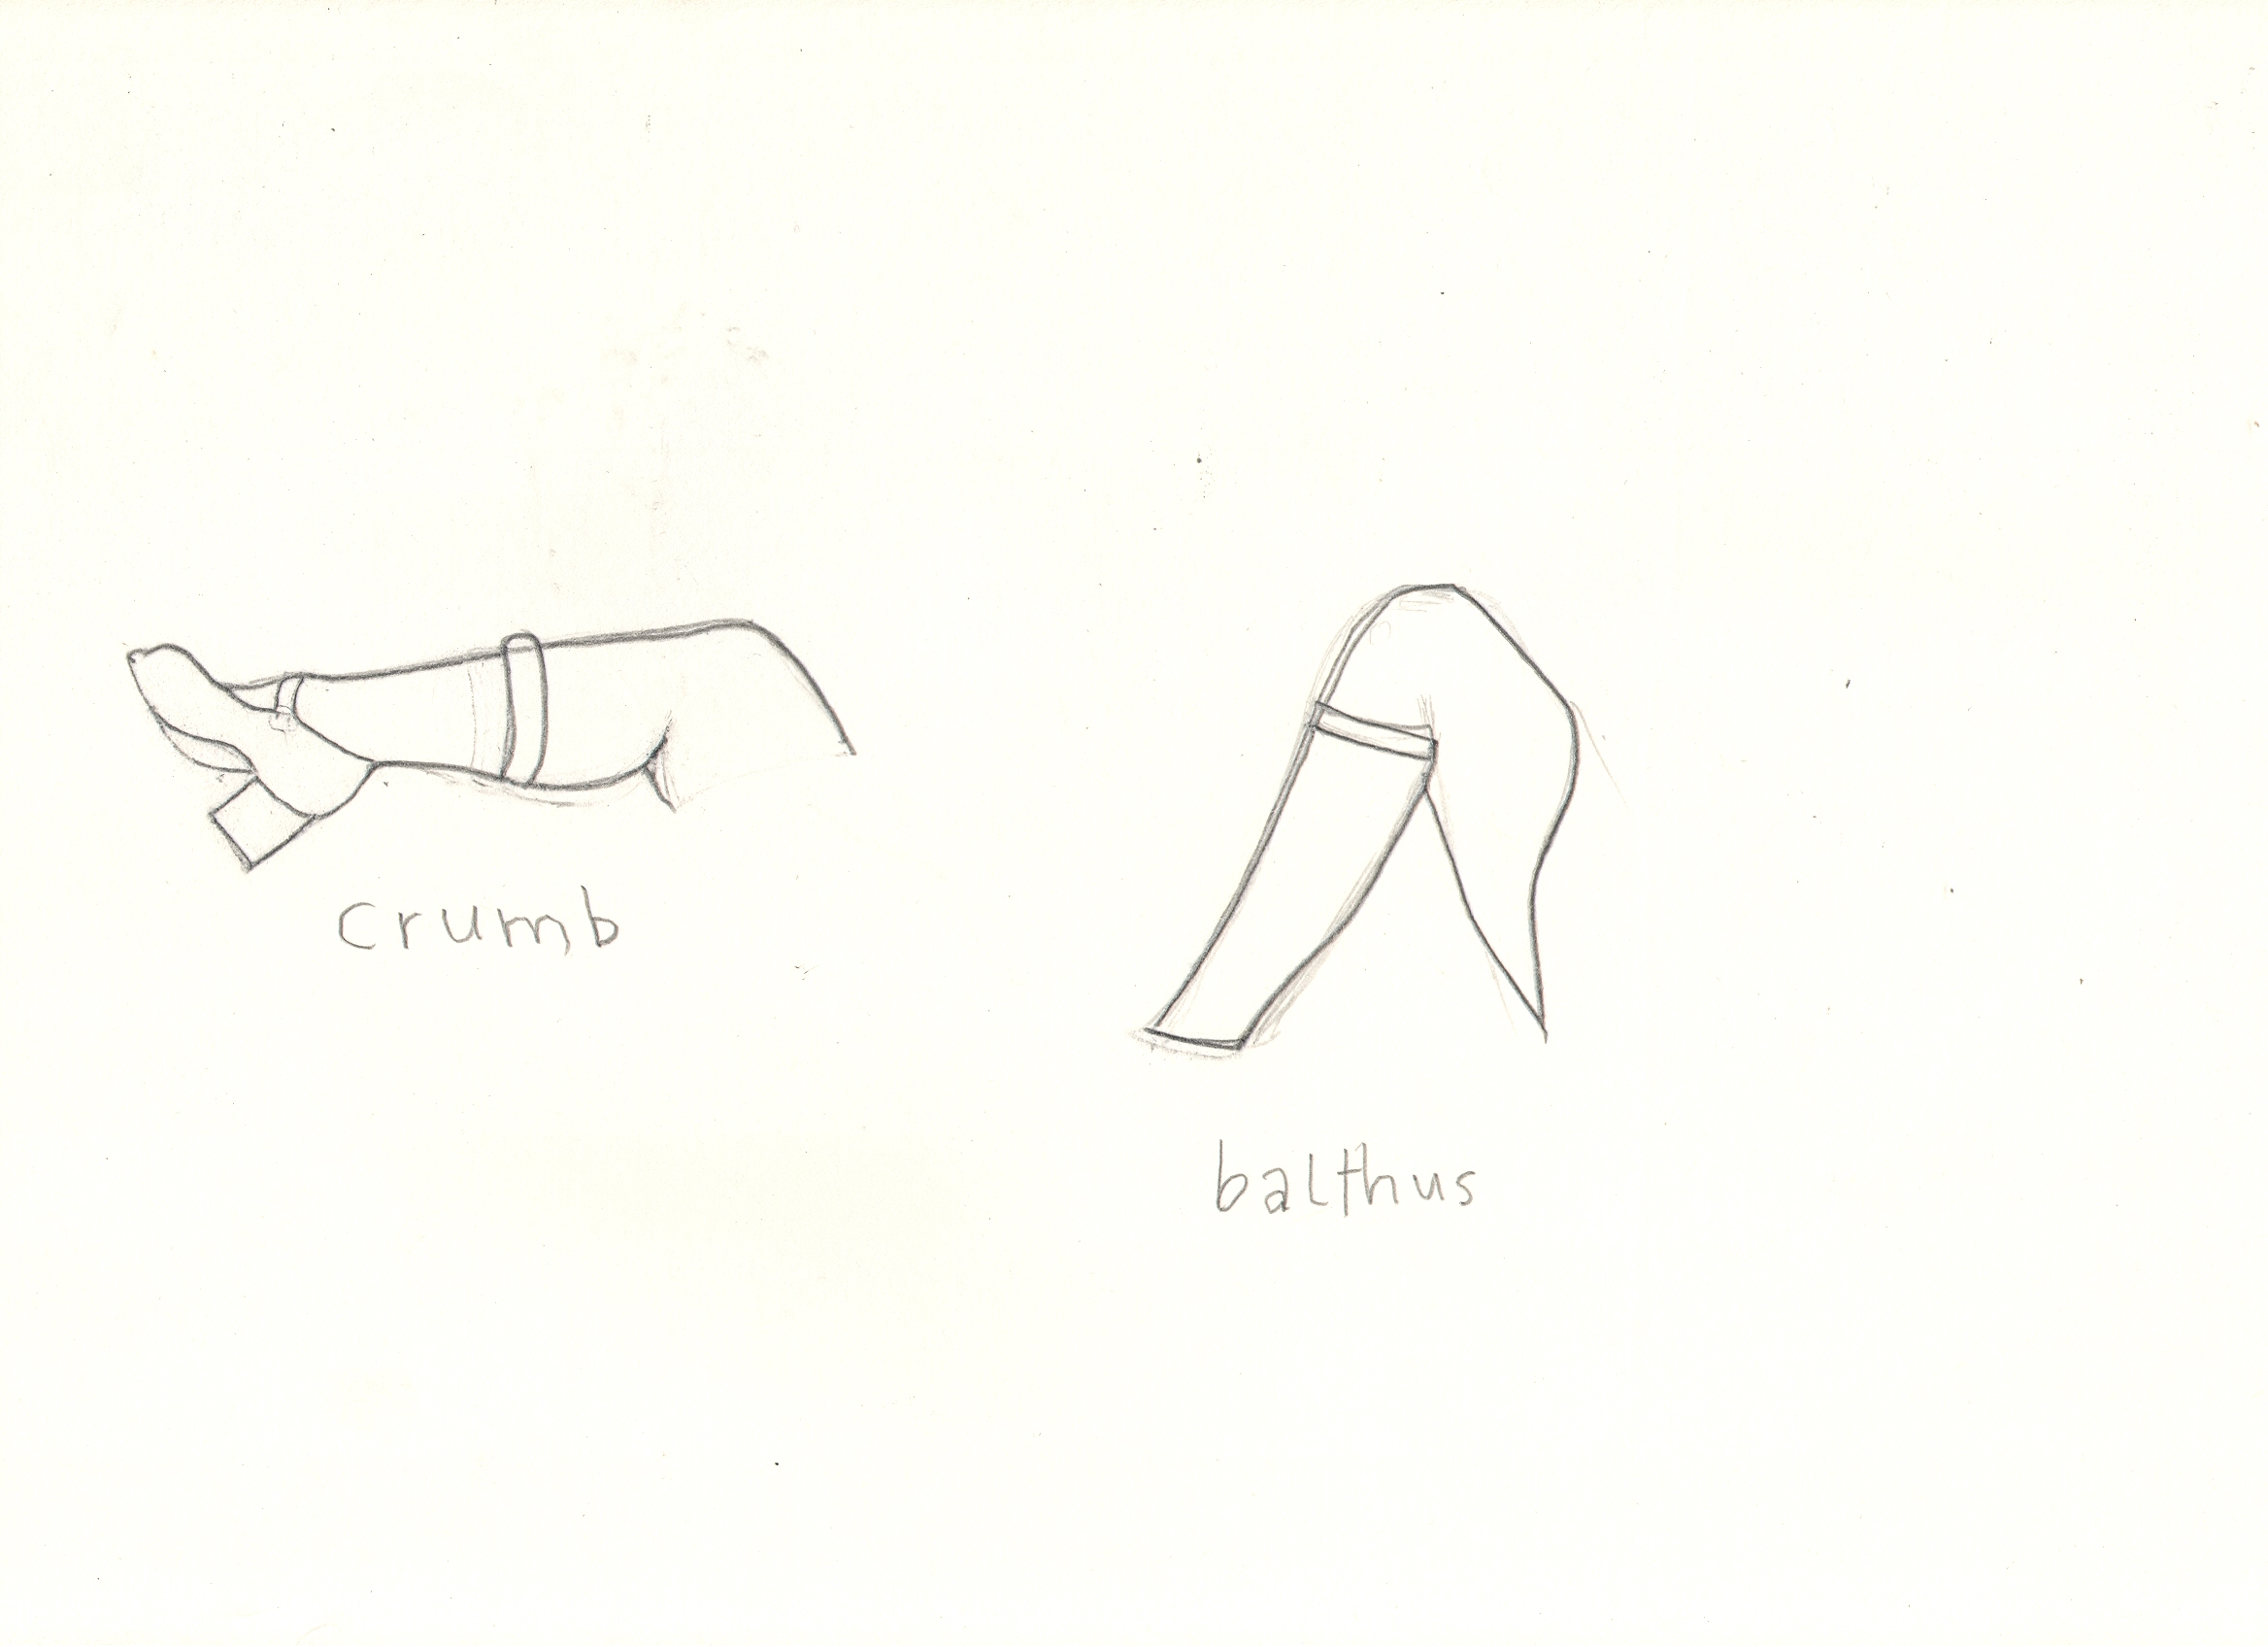 O.T. ( Serie Das Duell V Robert Crumb & Balthus ), 2018  Bleistift auf Papier, 26x35.5cm